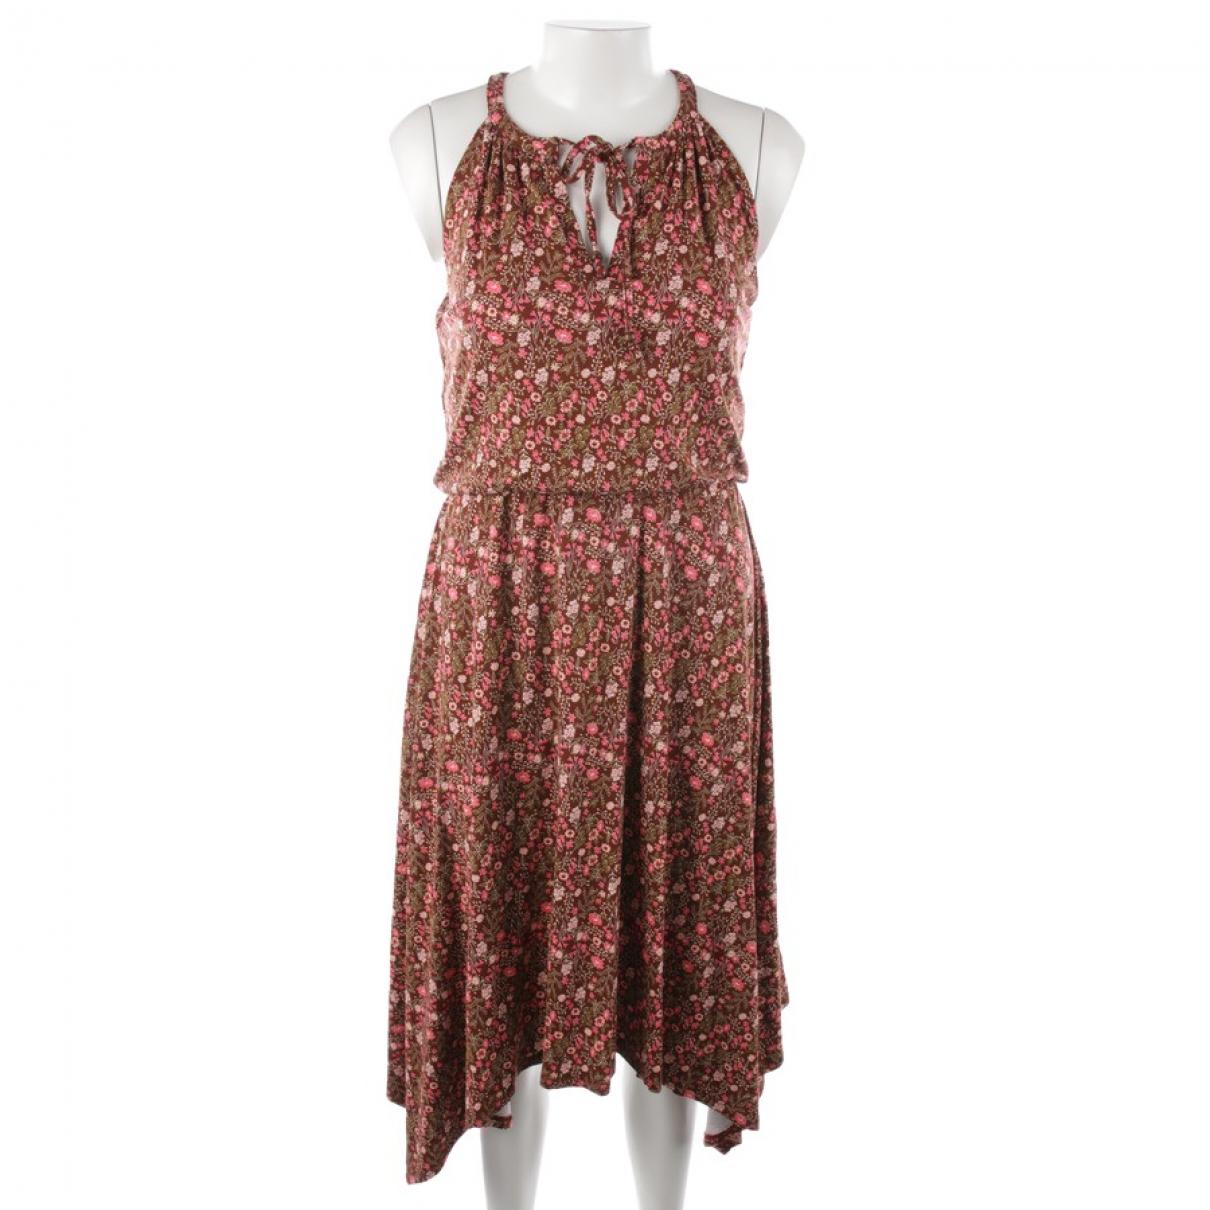 Rachel Zoe \N Brown dress for Women M International